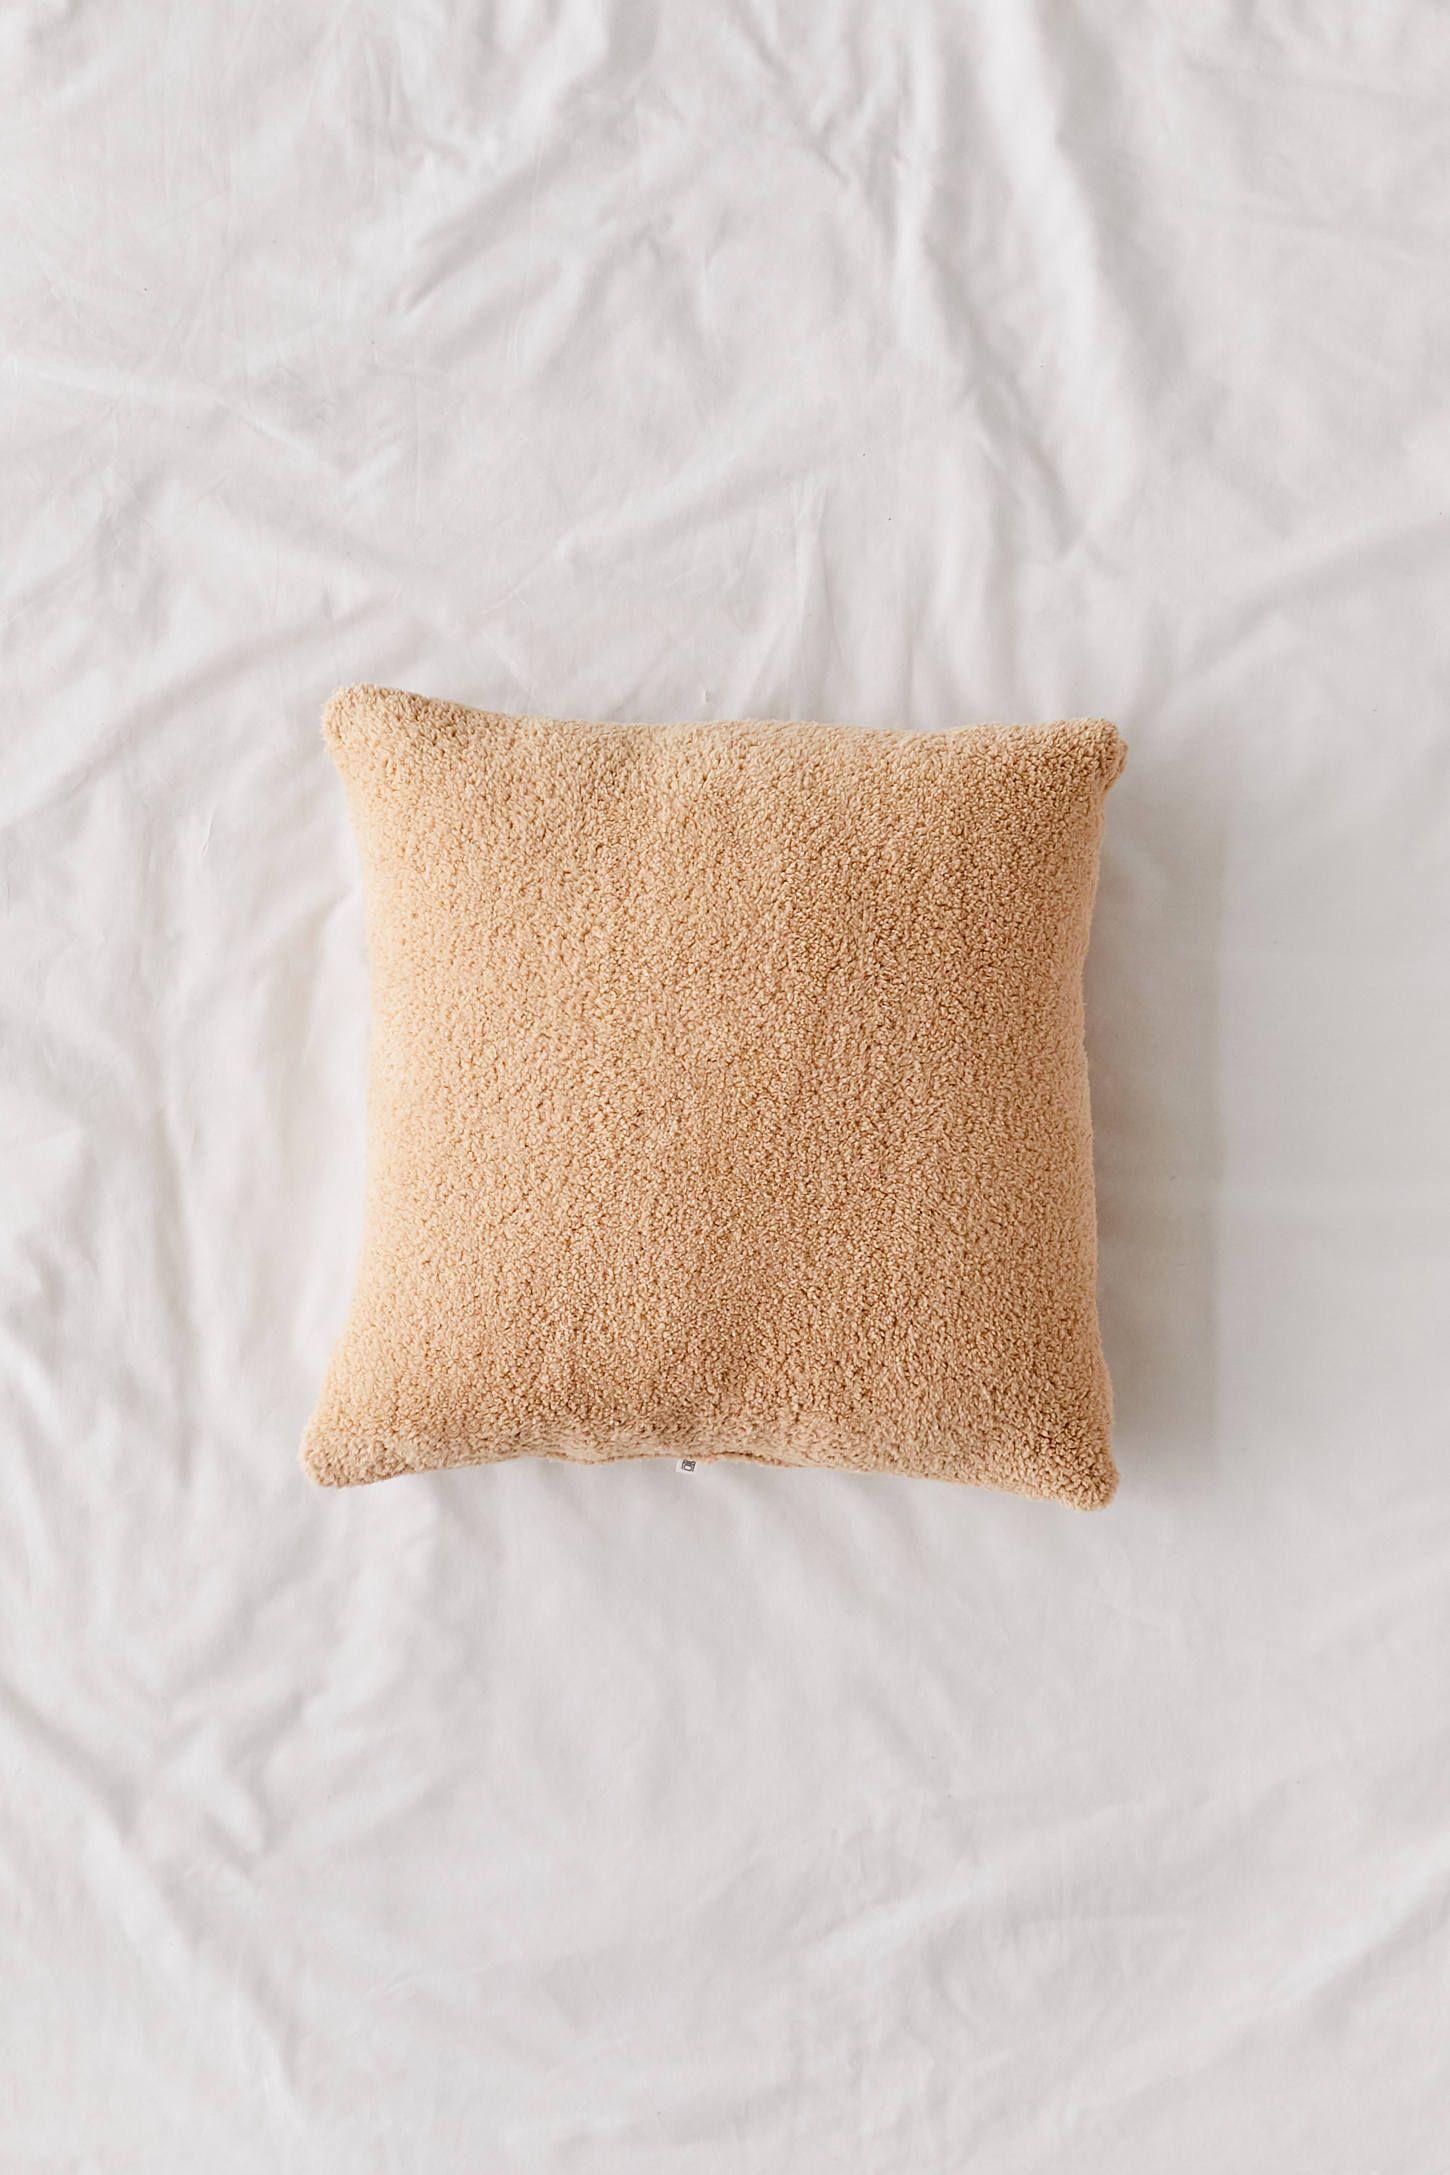 Sherpa Throw Pillow Throw Pillows Sherpa Throw Plush Throw Pillows